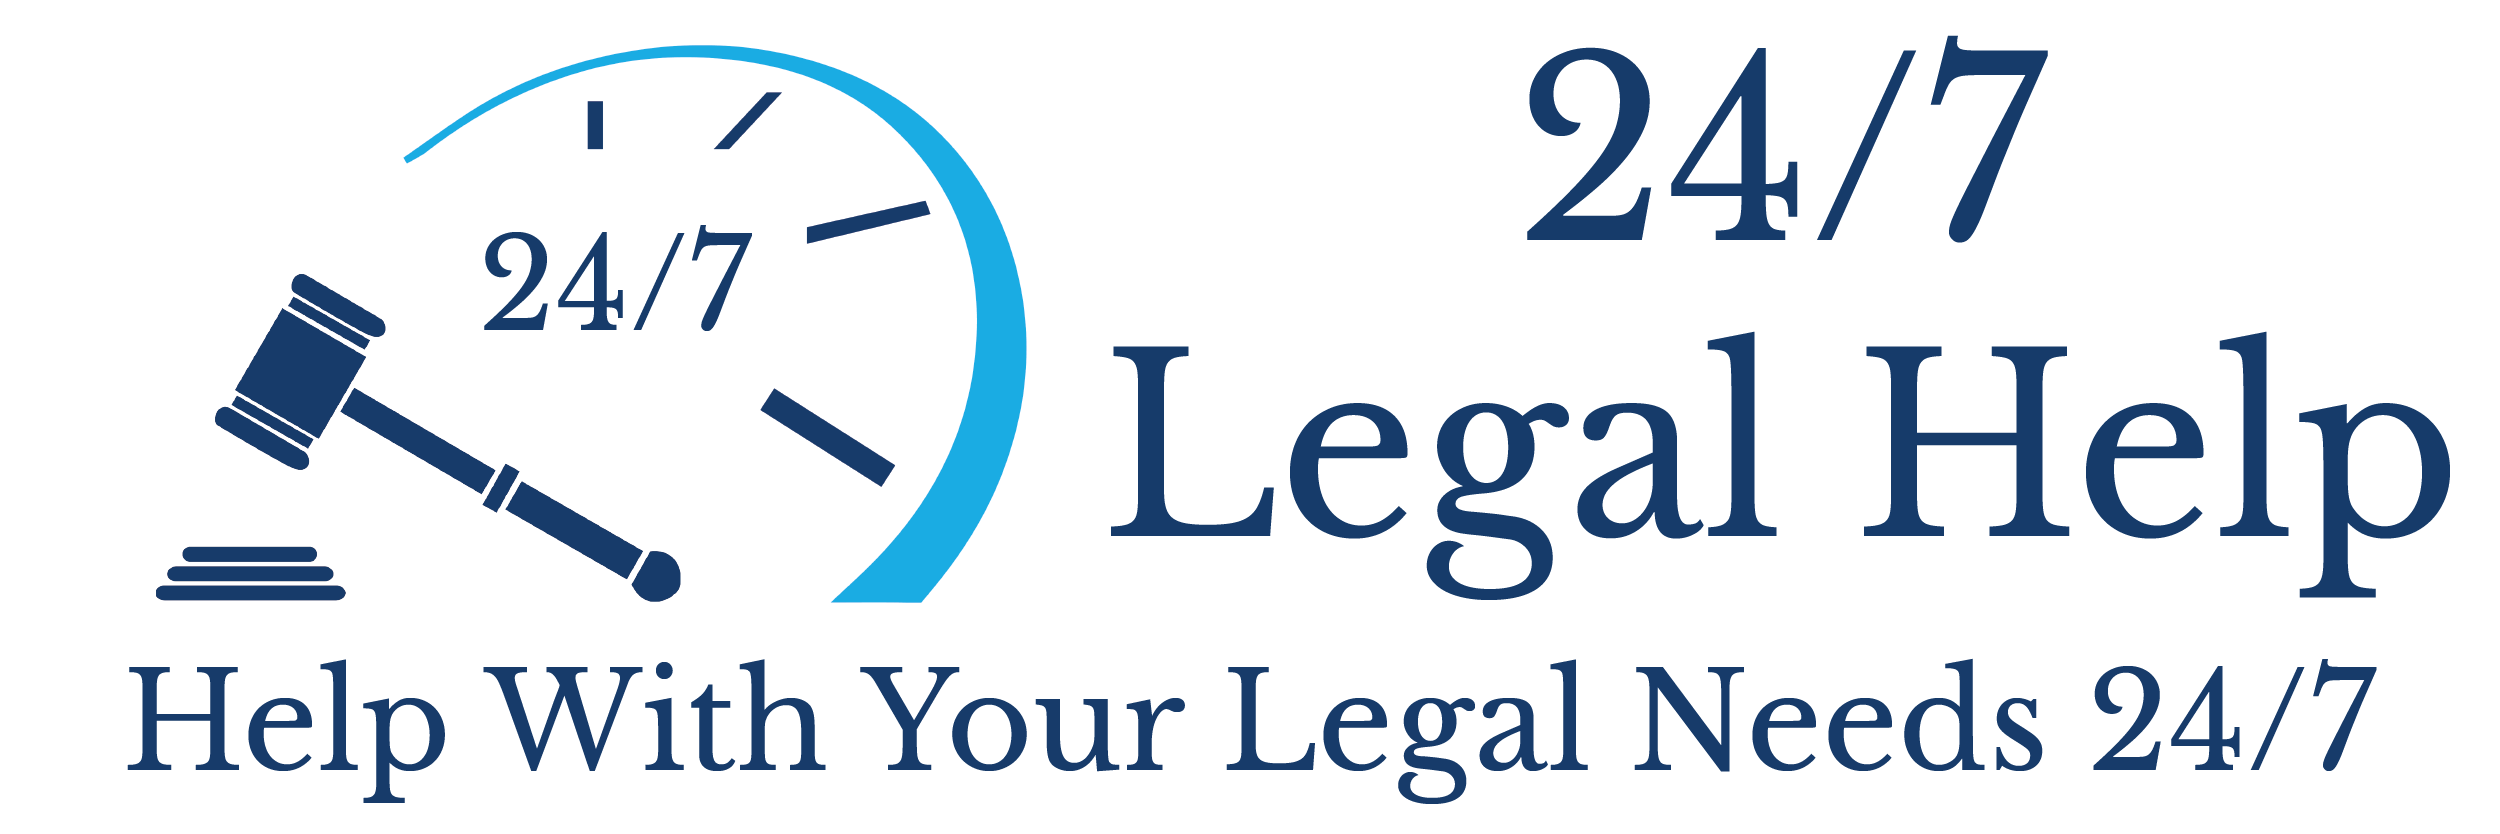 24/7 Legal Help